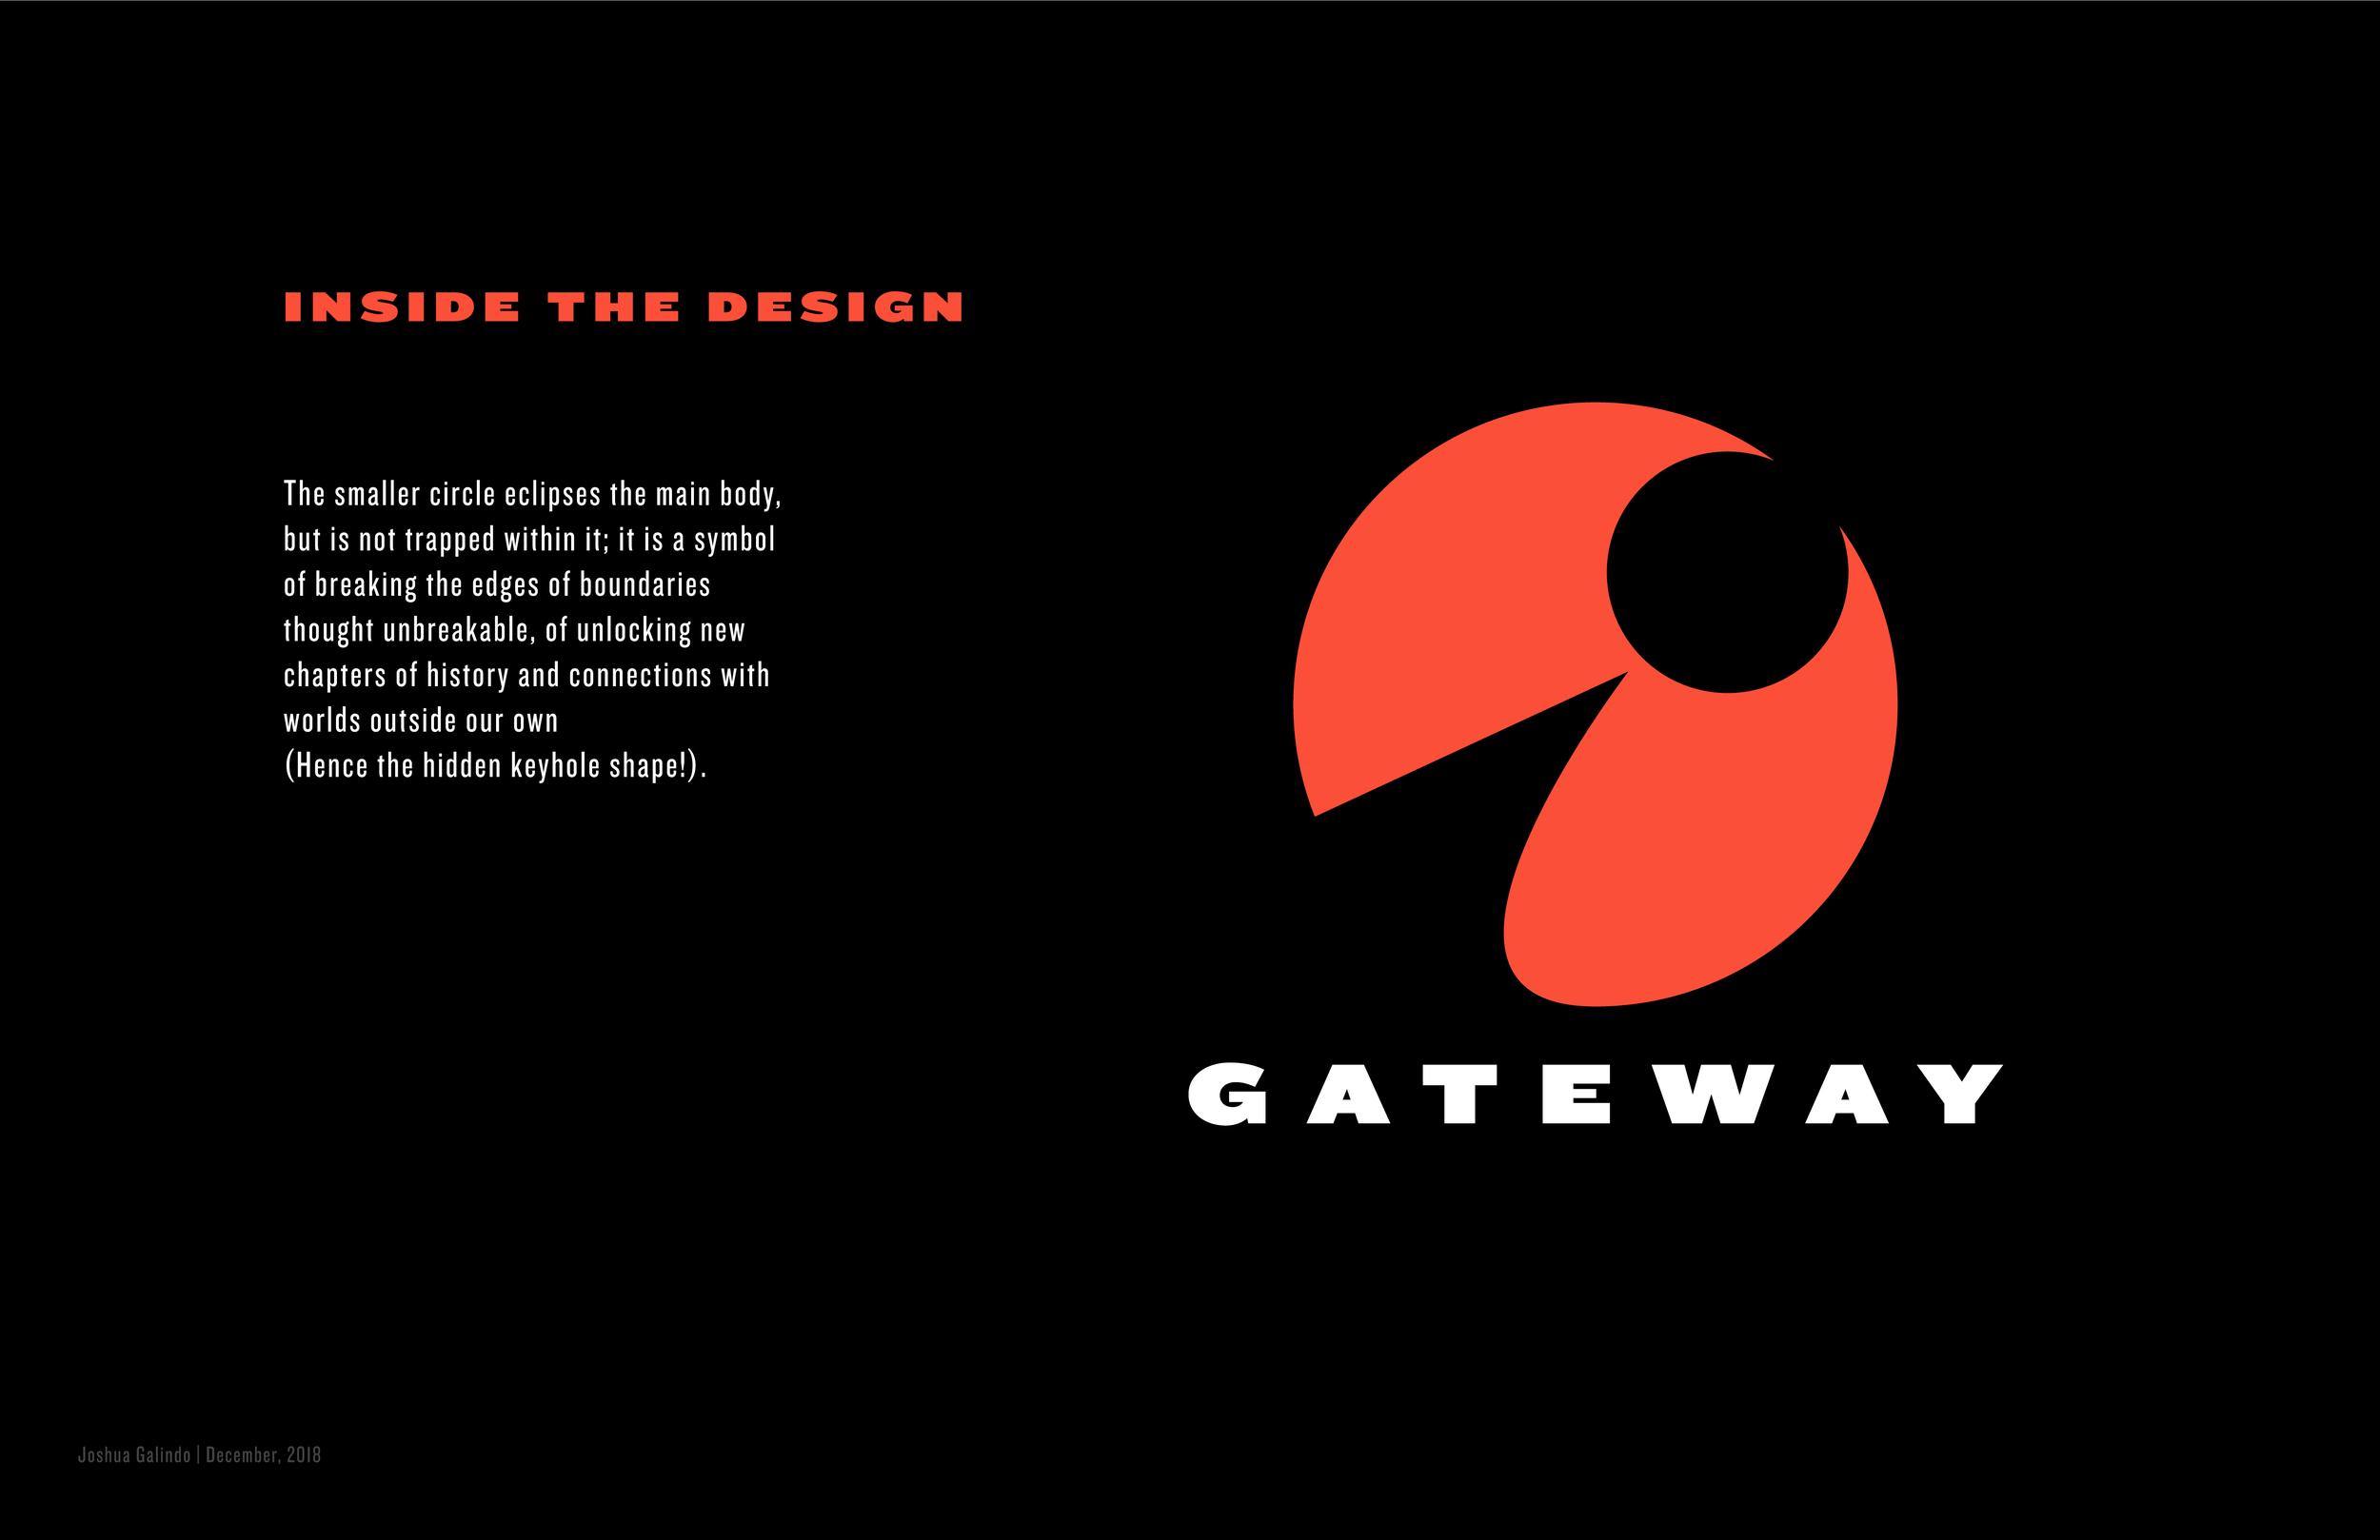 GatewayLogo_Info__JoshuaGalindo_01-08.png